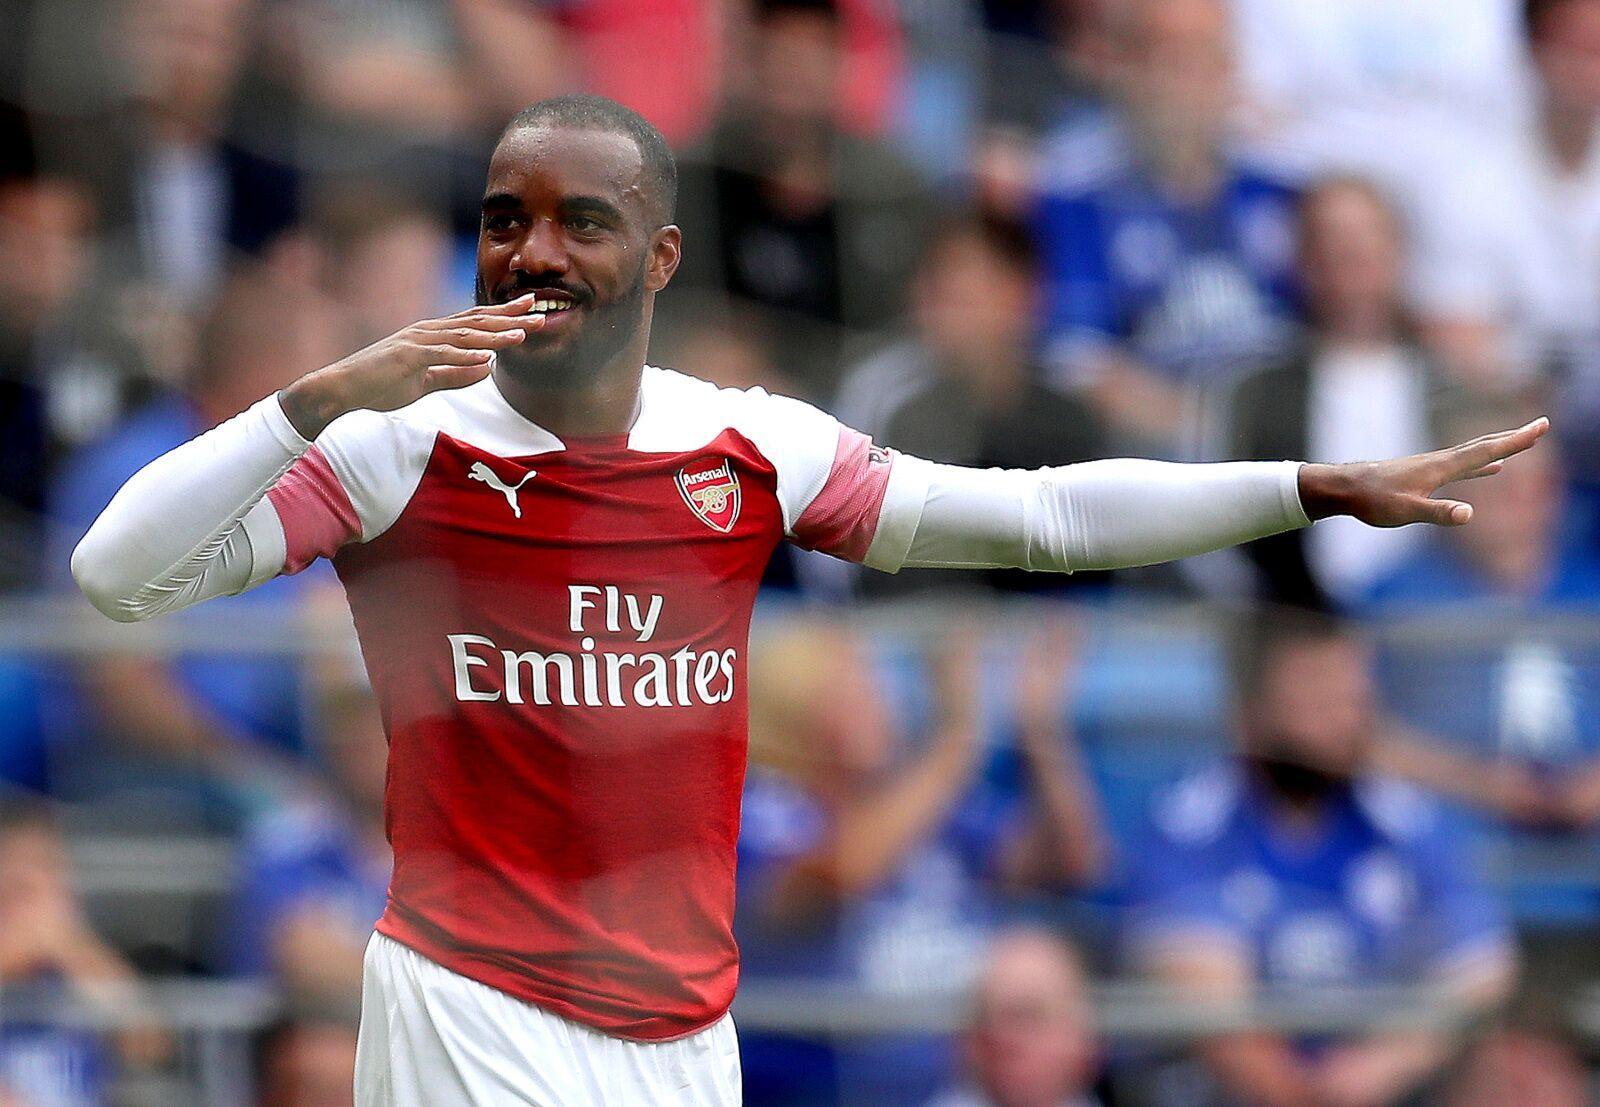 Arsenal: 3 stars of 2018/19 season so far